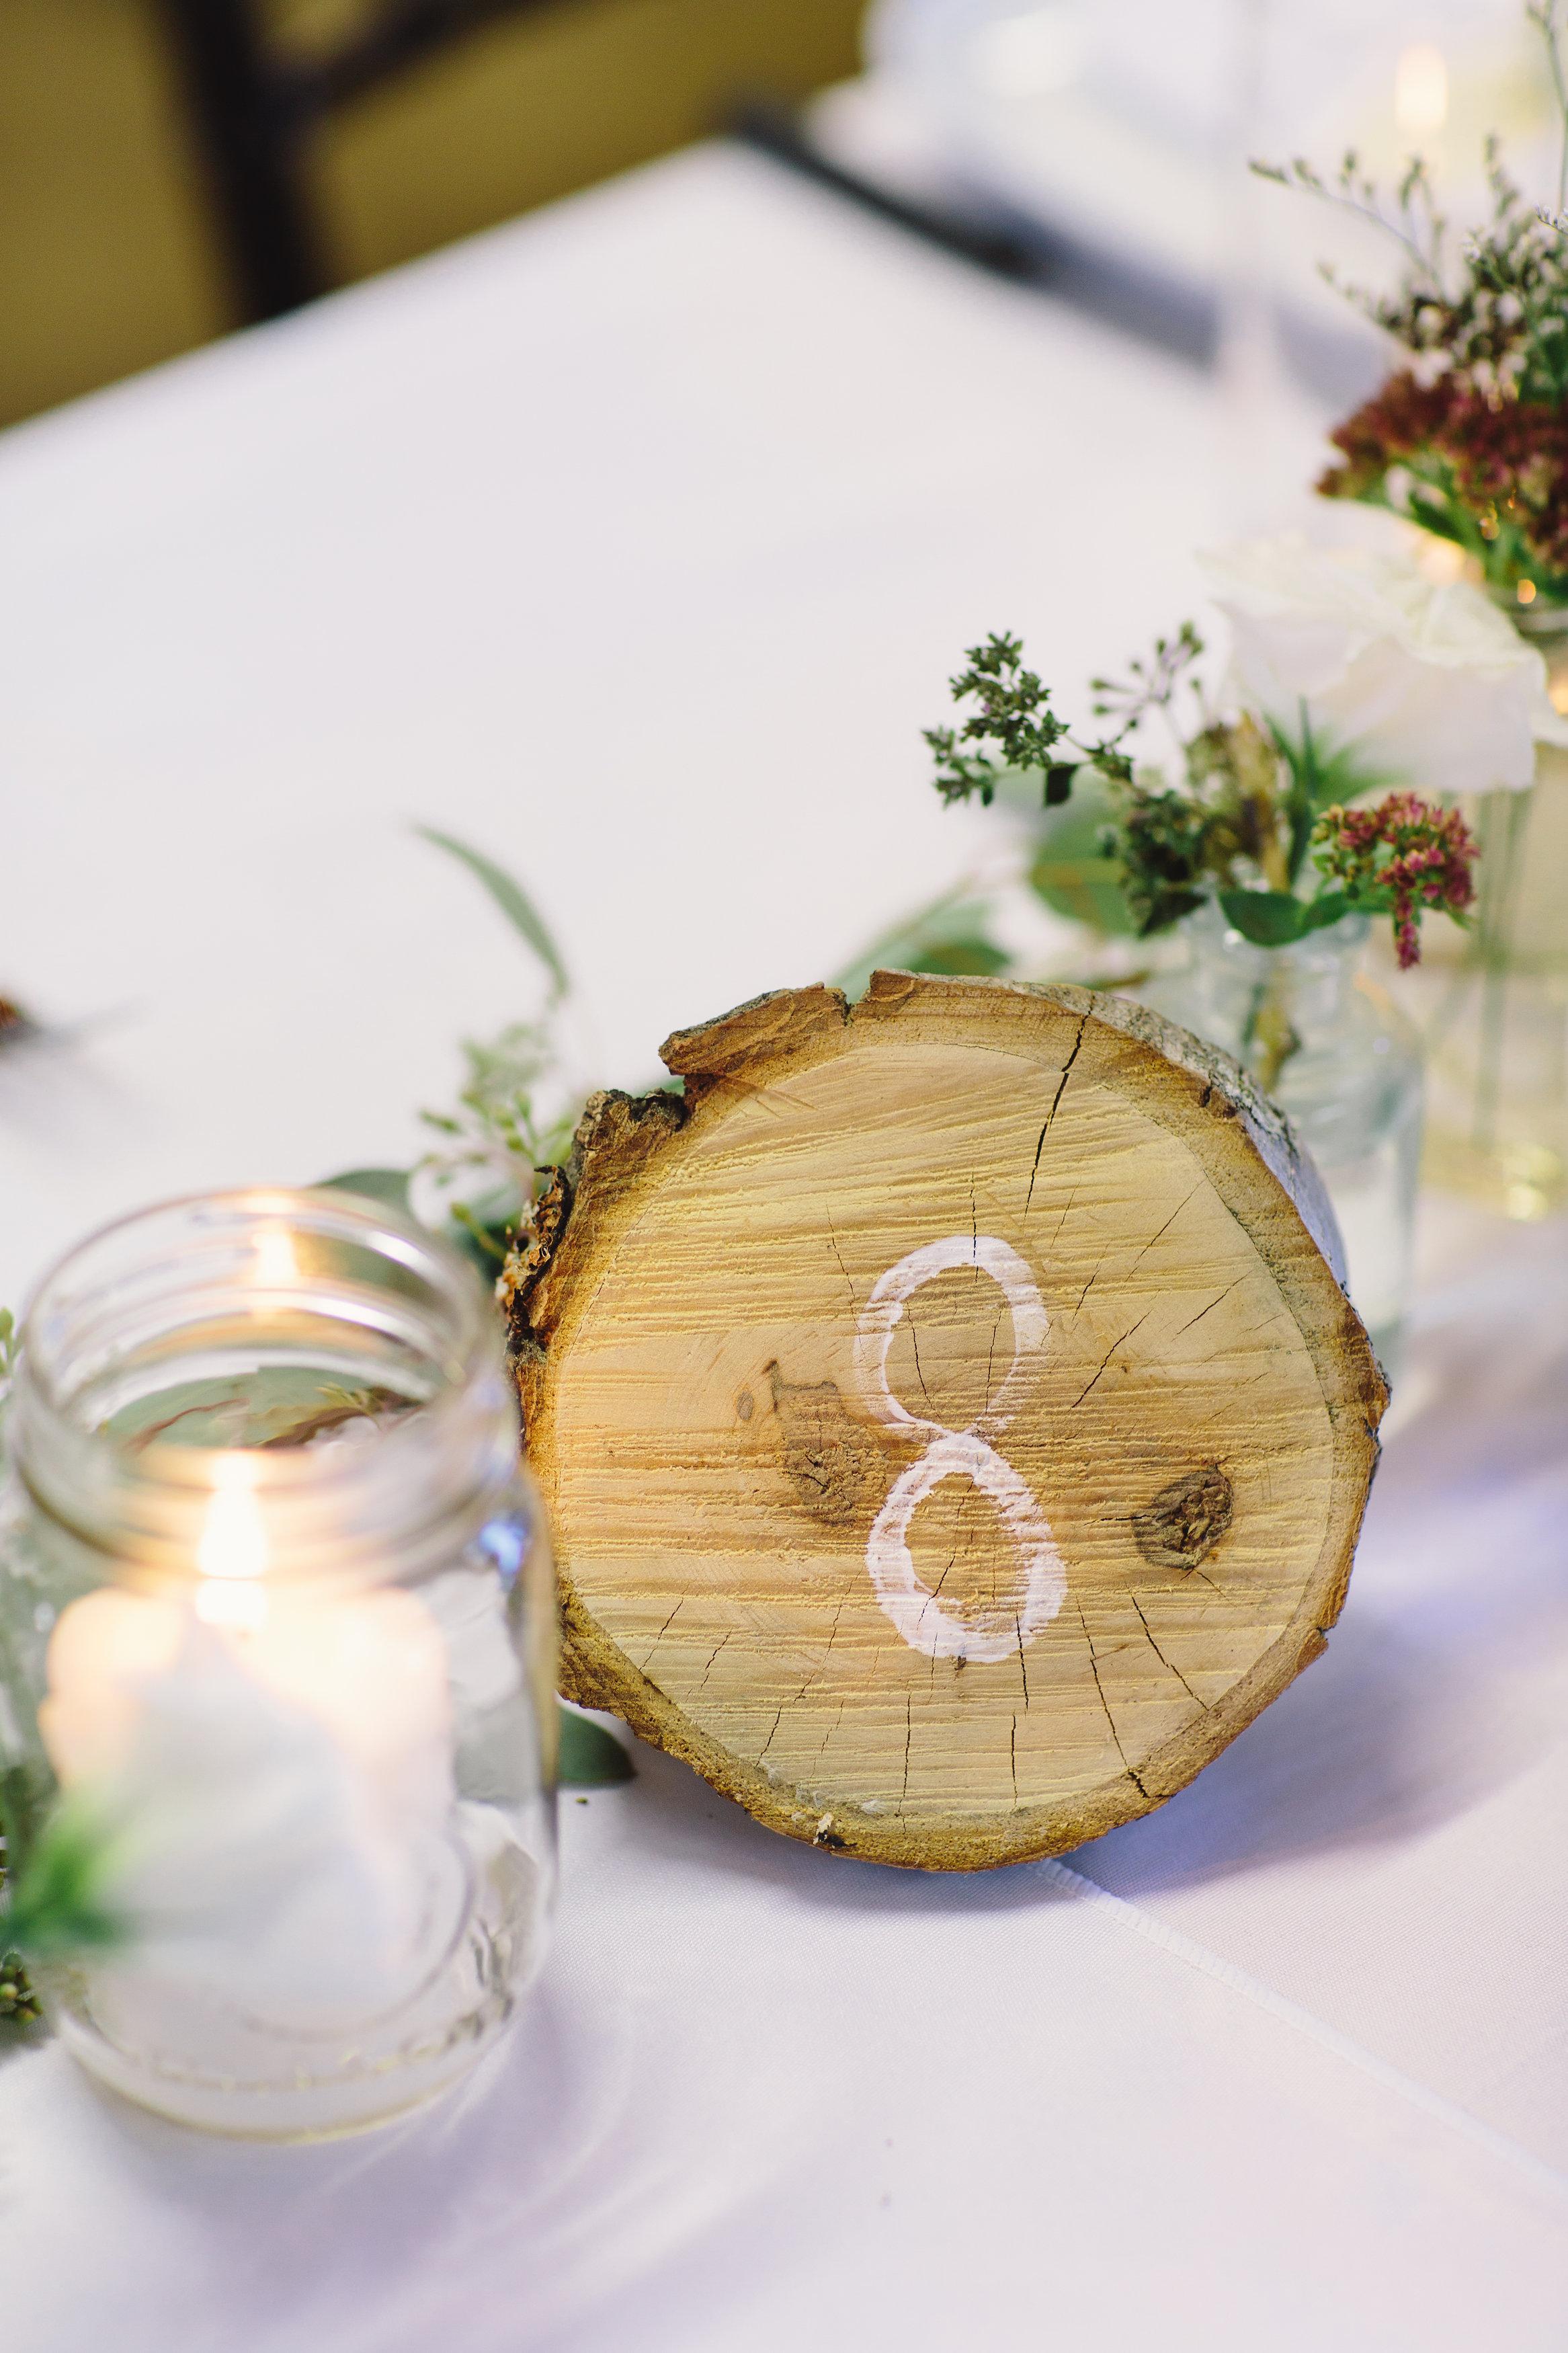 marial-daniel-wedding-balls-falls-sara-wilde-photography-0640.jpg